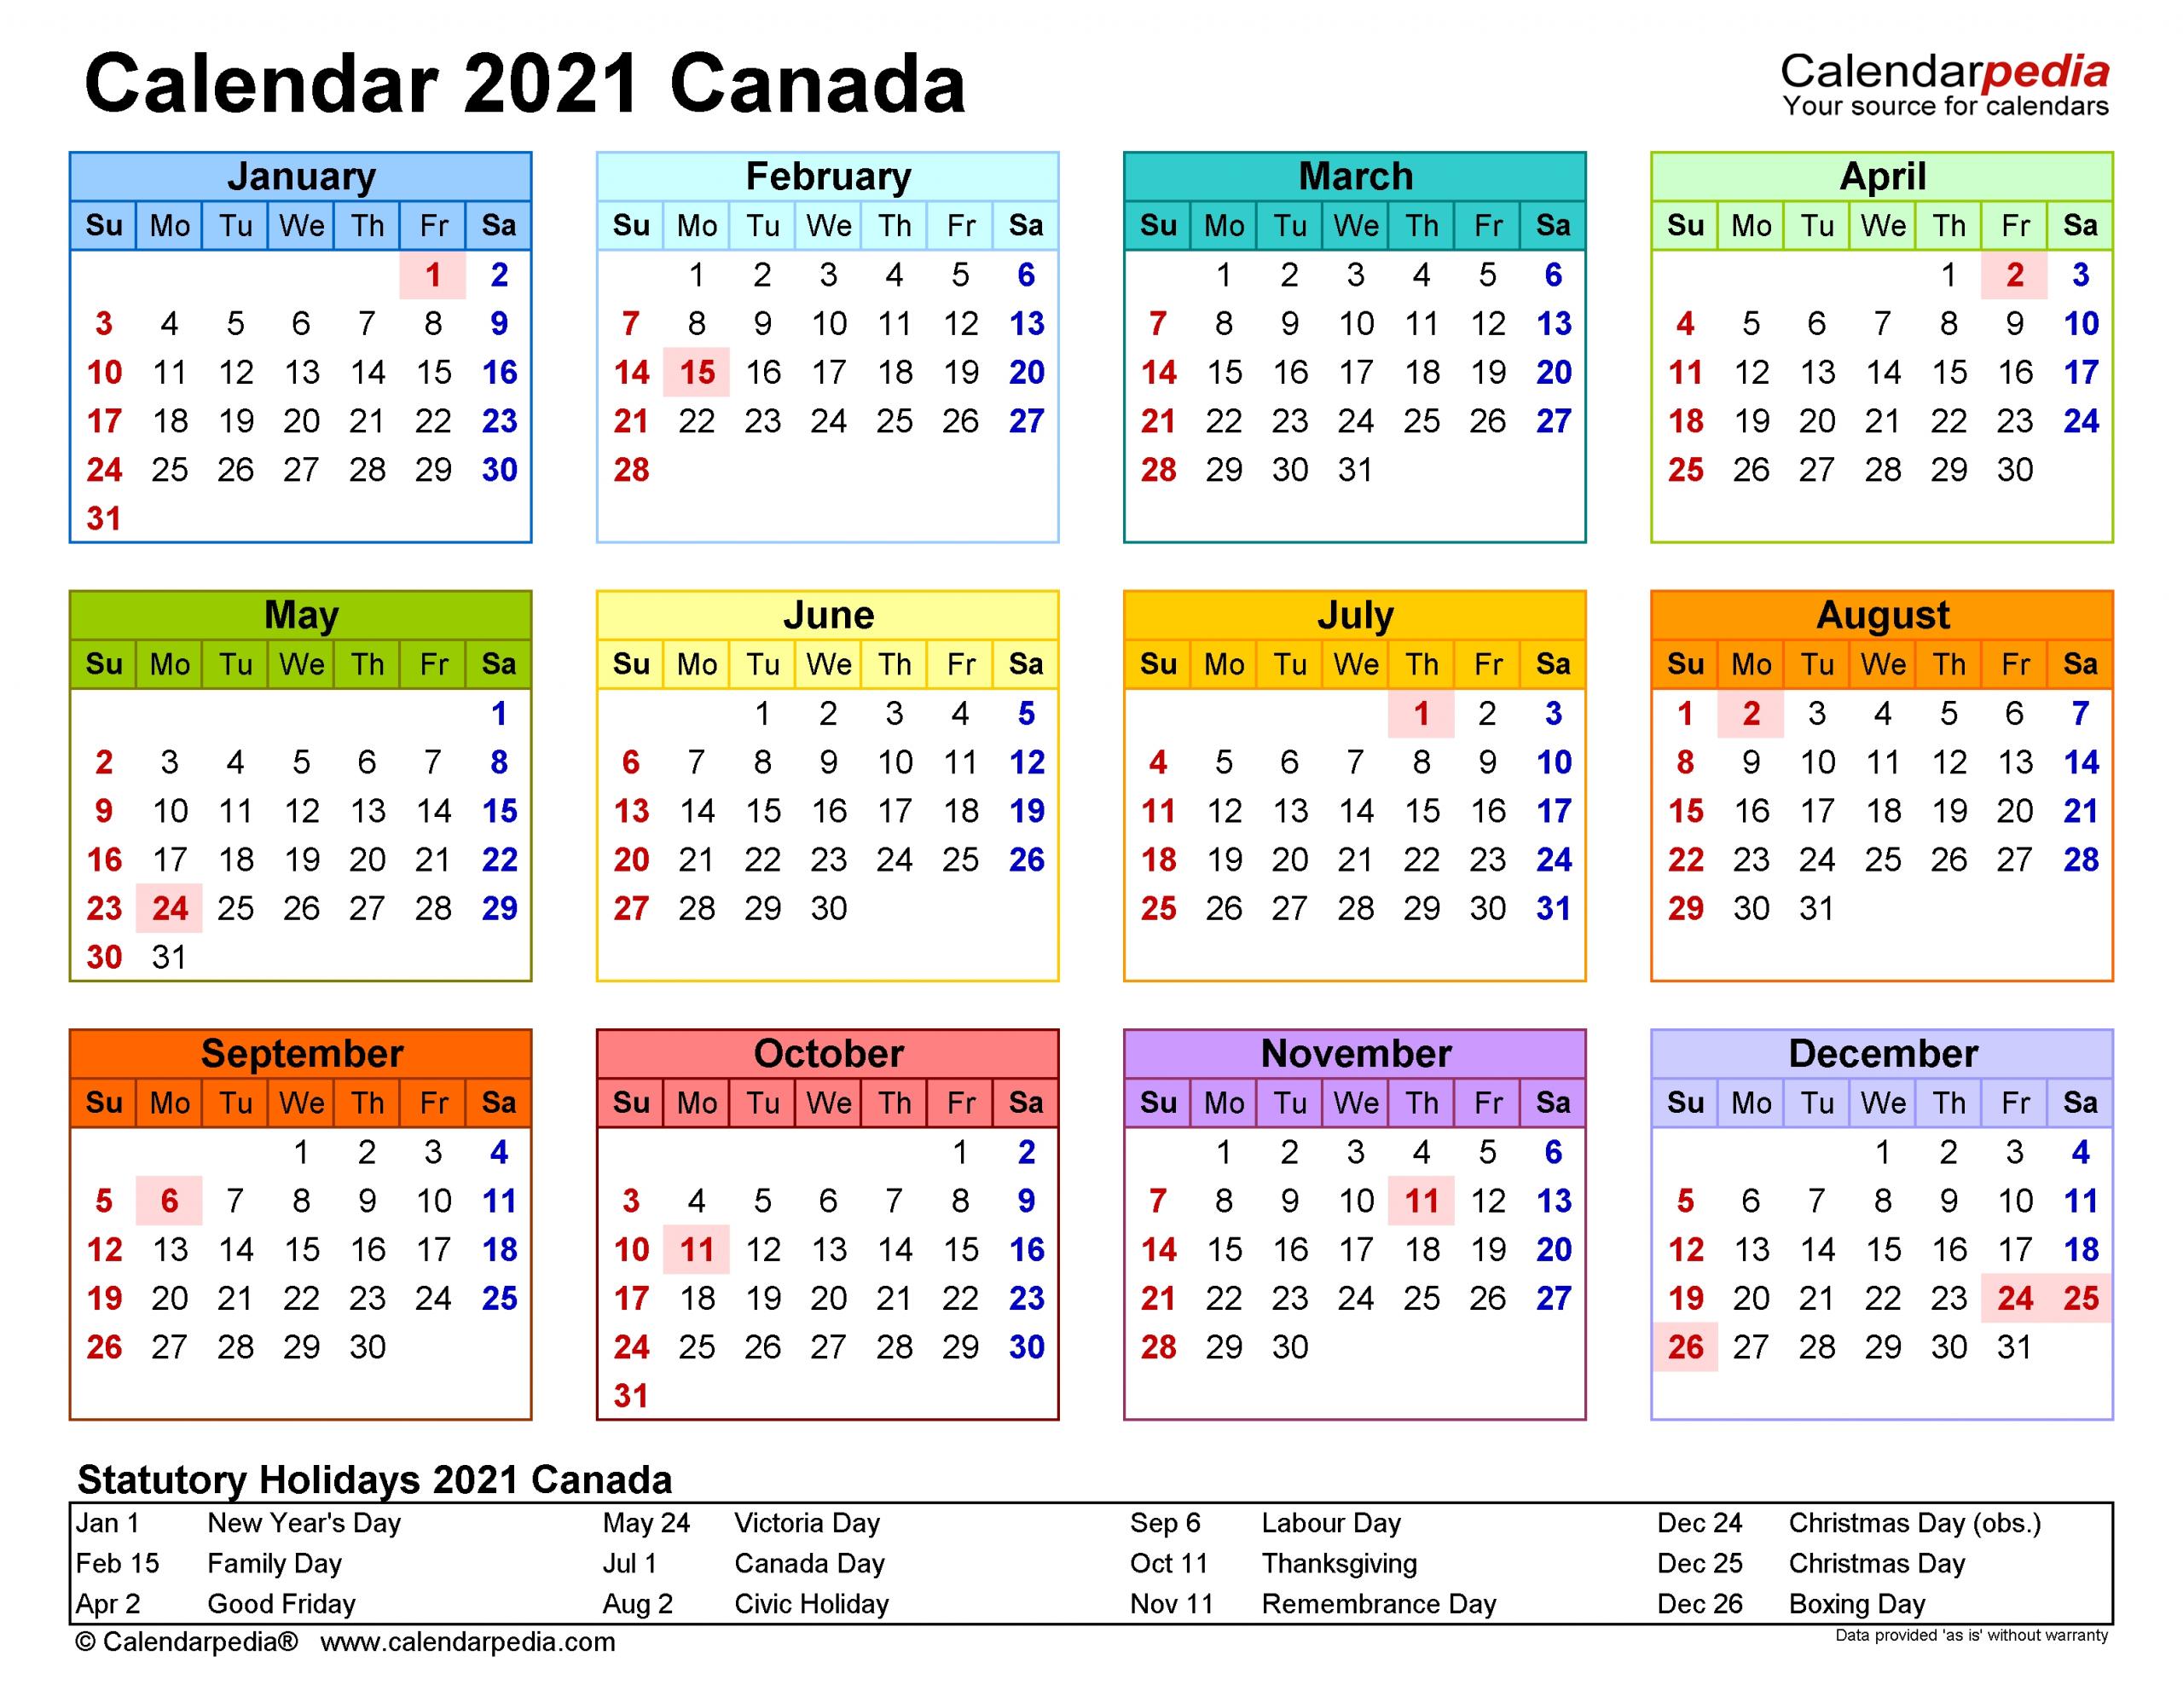 Canada Calendar 2021 - Free Printable Pdf Templates-June 2021 Calendar Free Printable 81/2 X 11